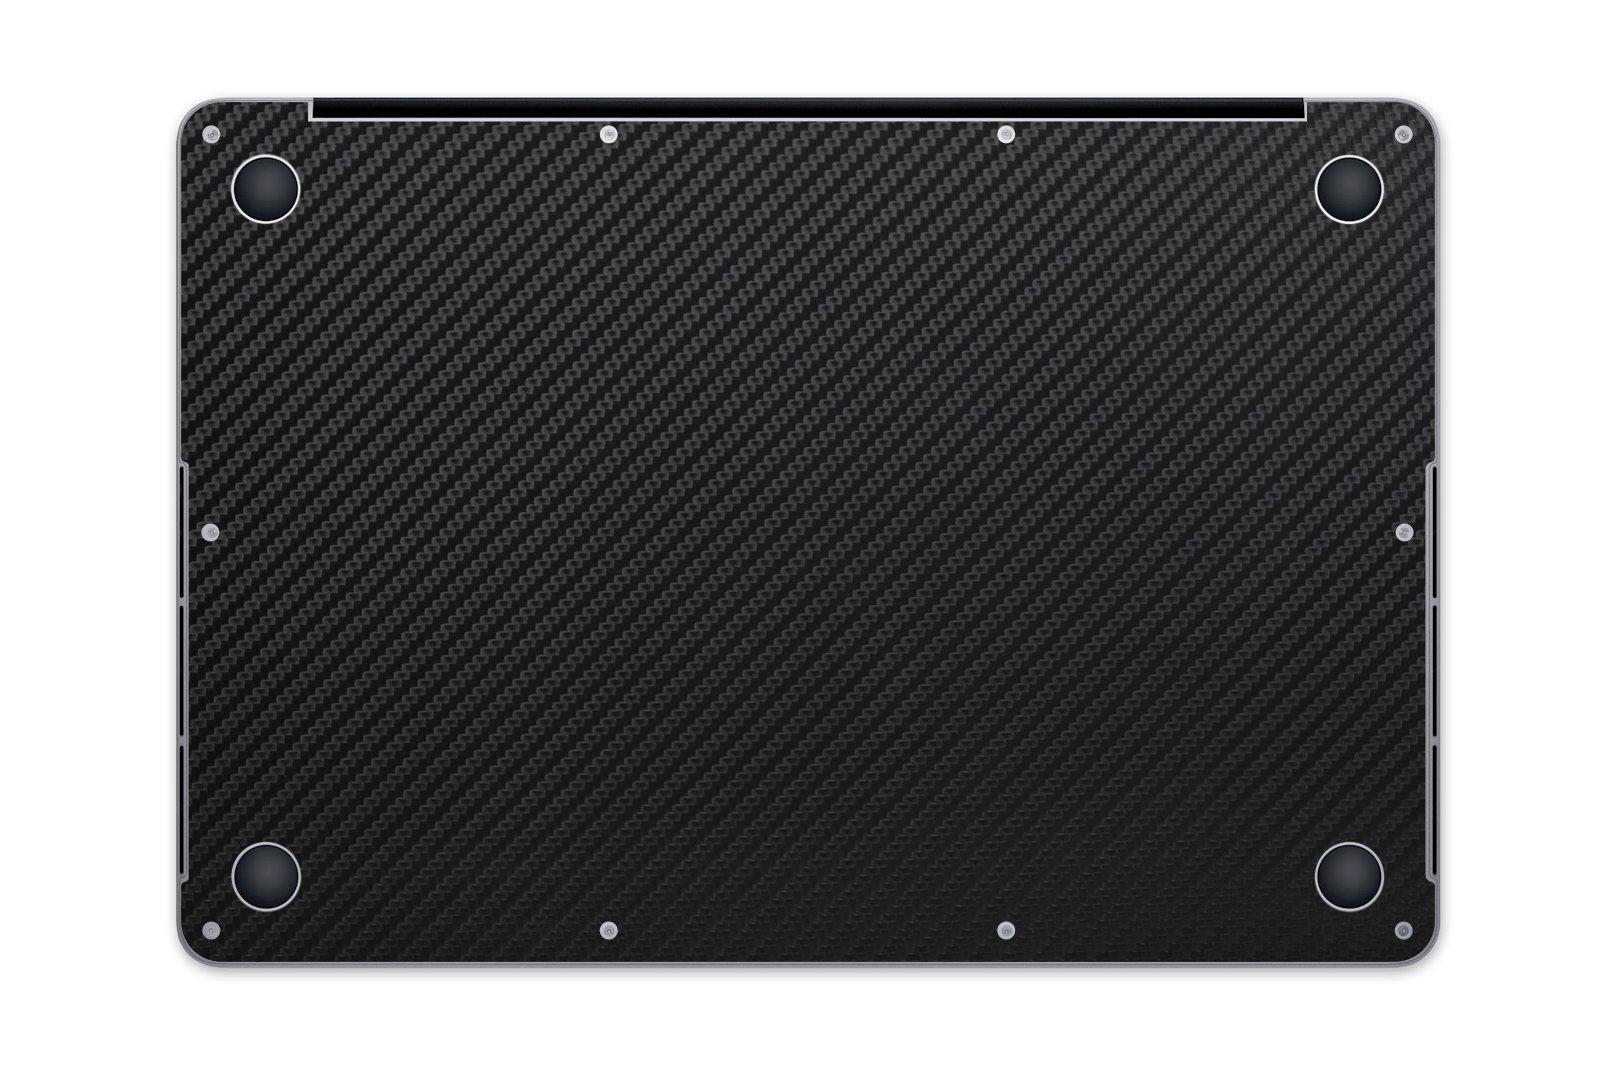 iCarbons Black Carbon Fiber Vinyl Skin for MacBook Pro 15'' Retina Full Combo by iCarbons (Image #3)